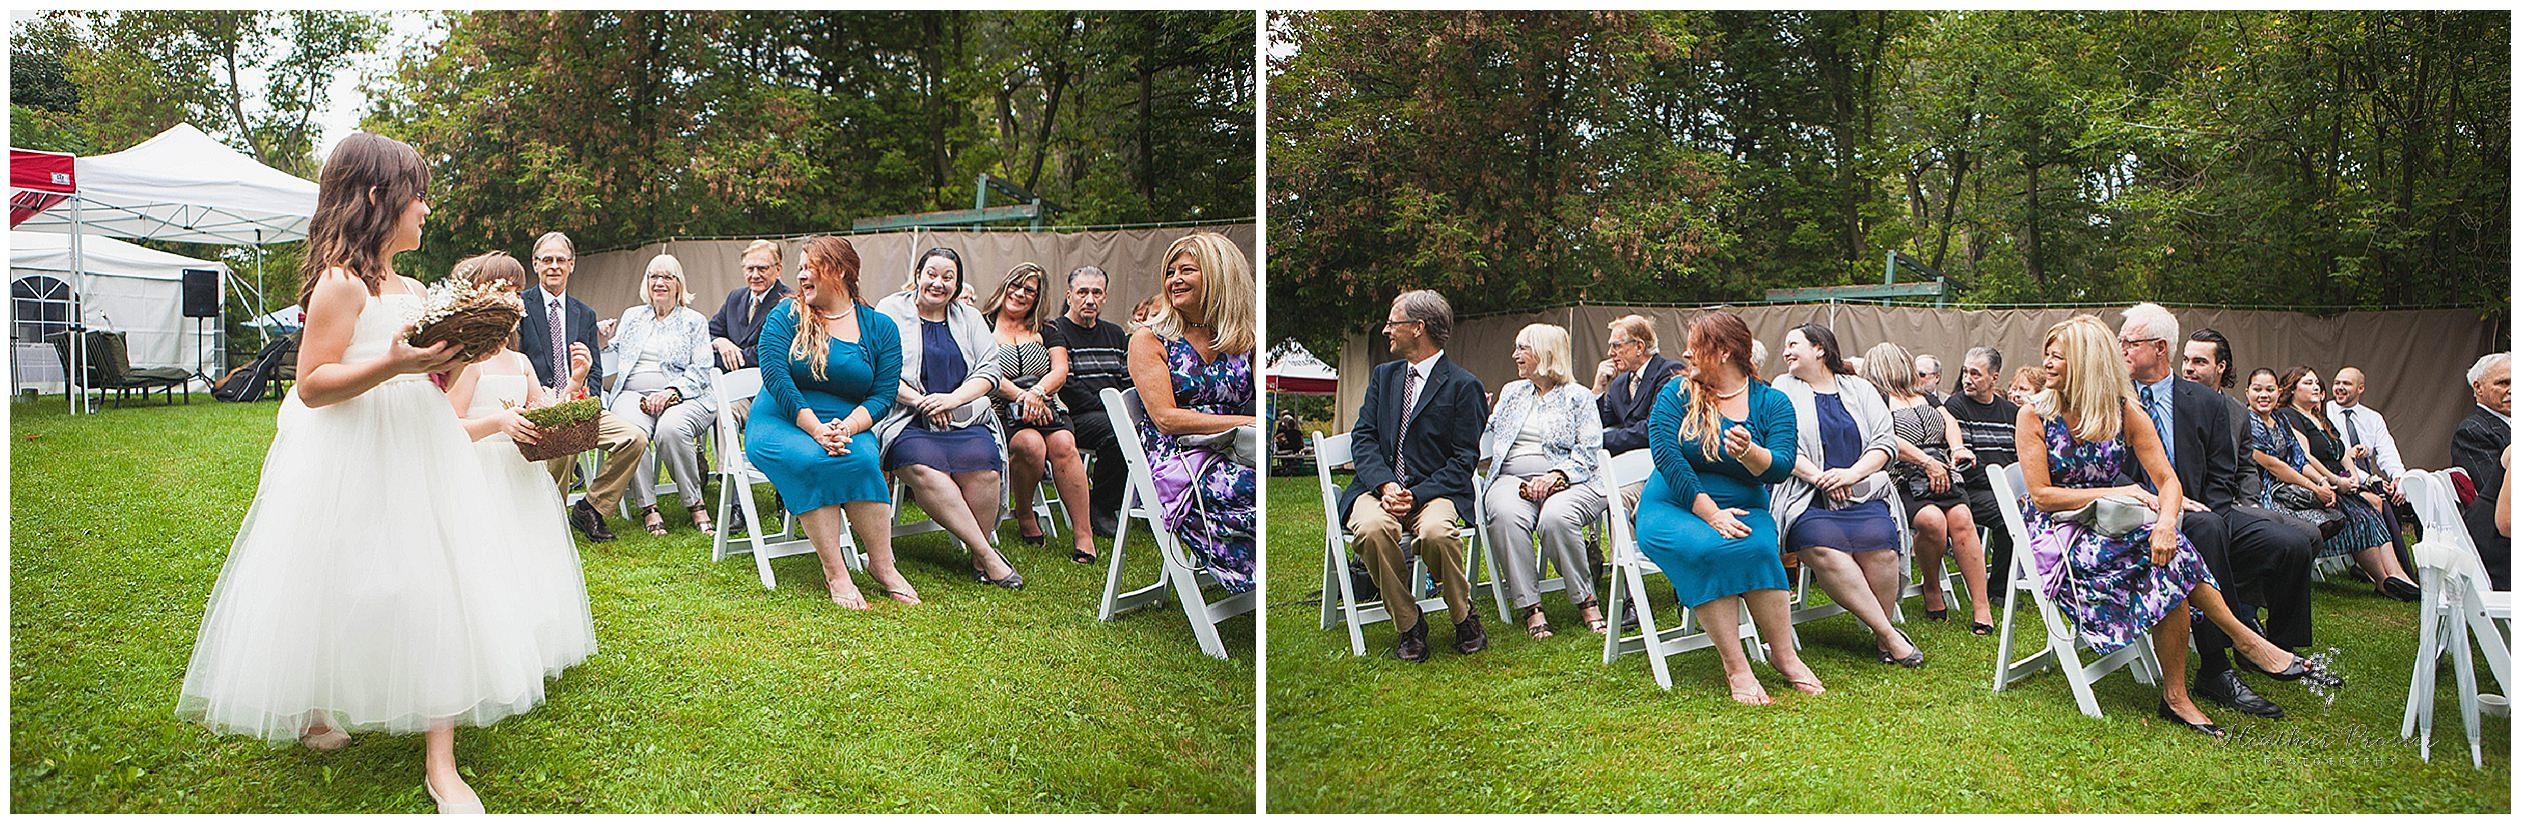 Bowmanville Wedding Photography_0180.jpg